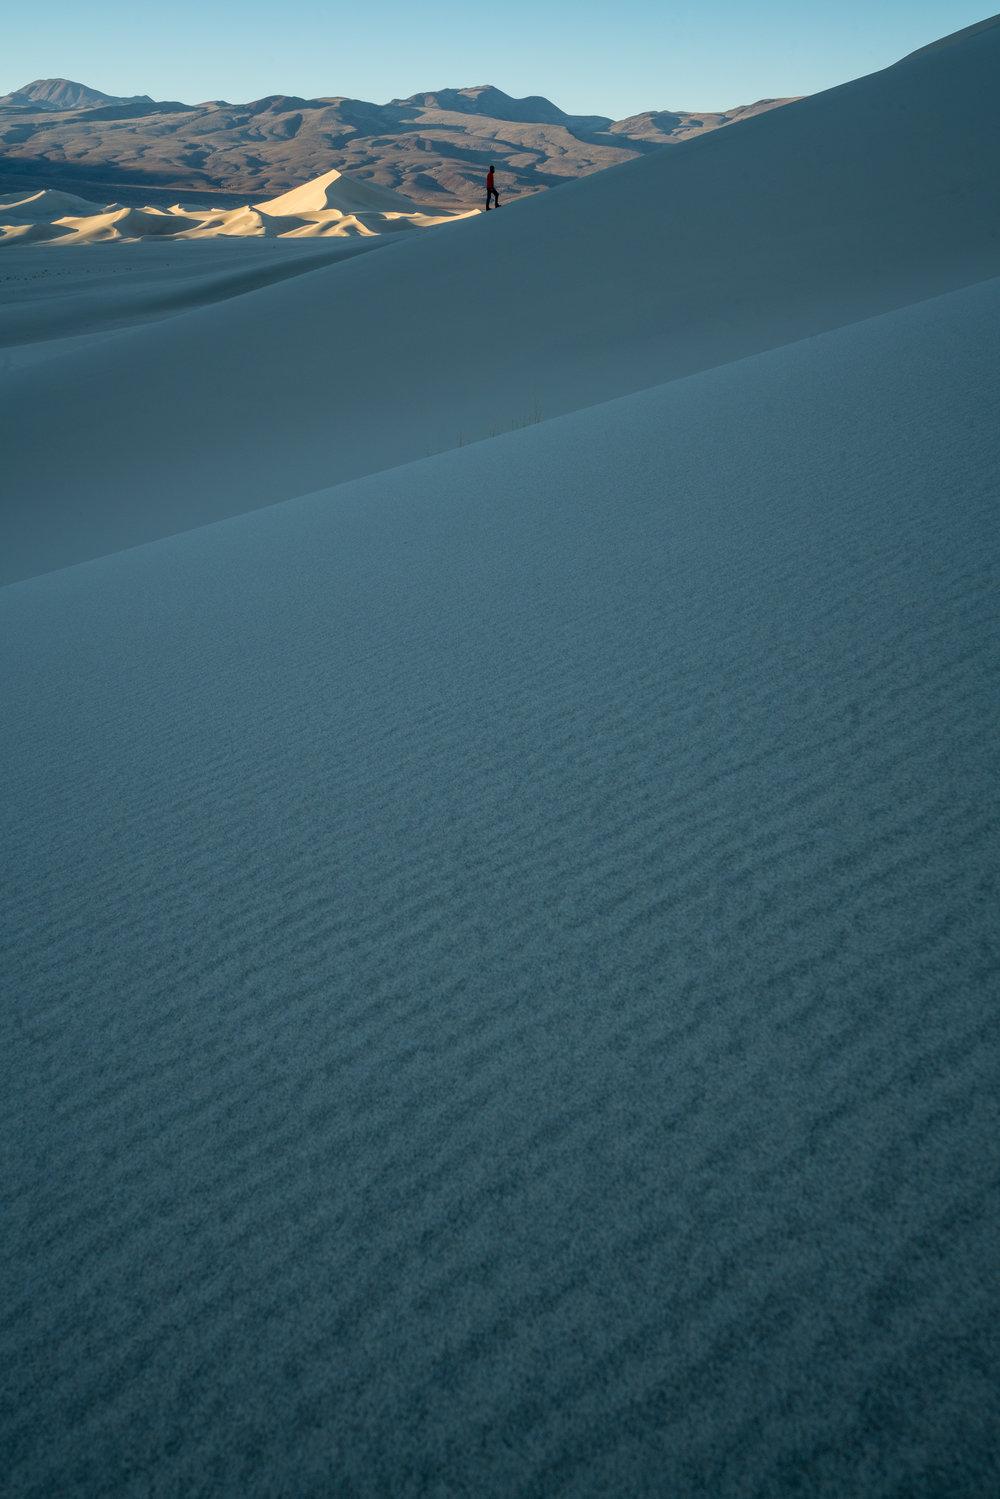 Eureka Sand Dunes, California